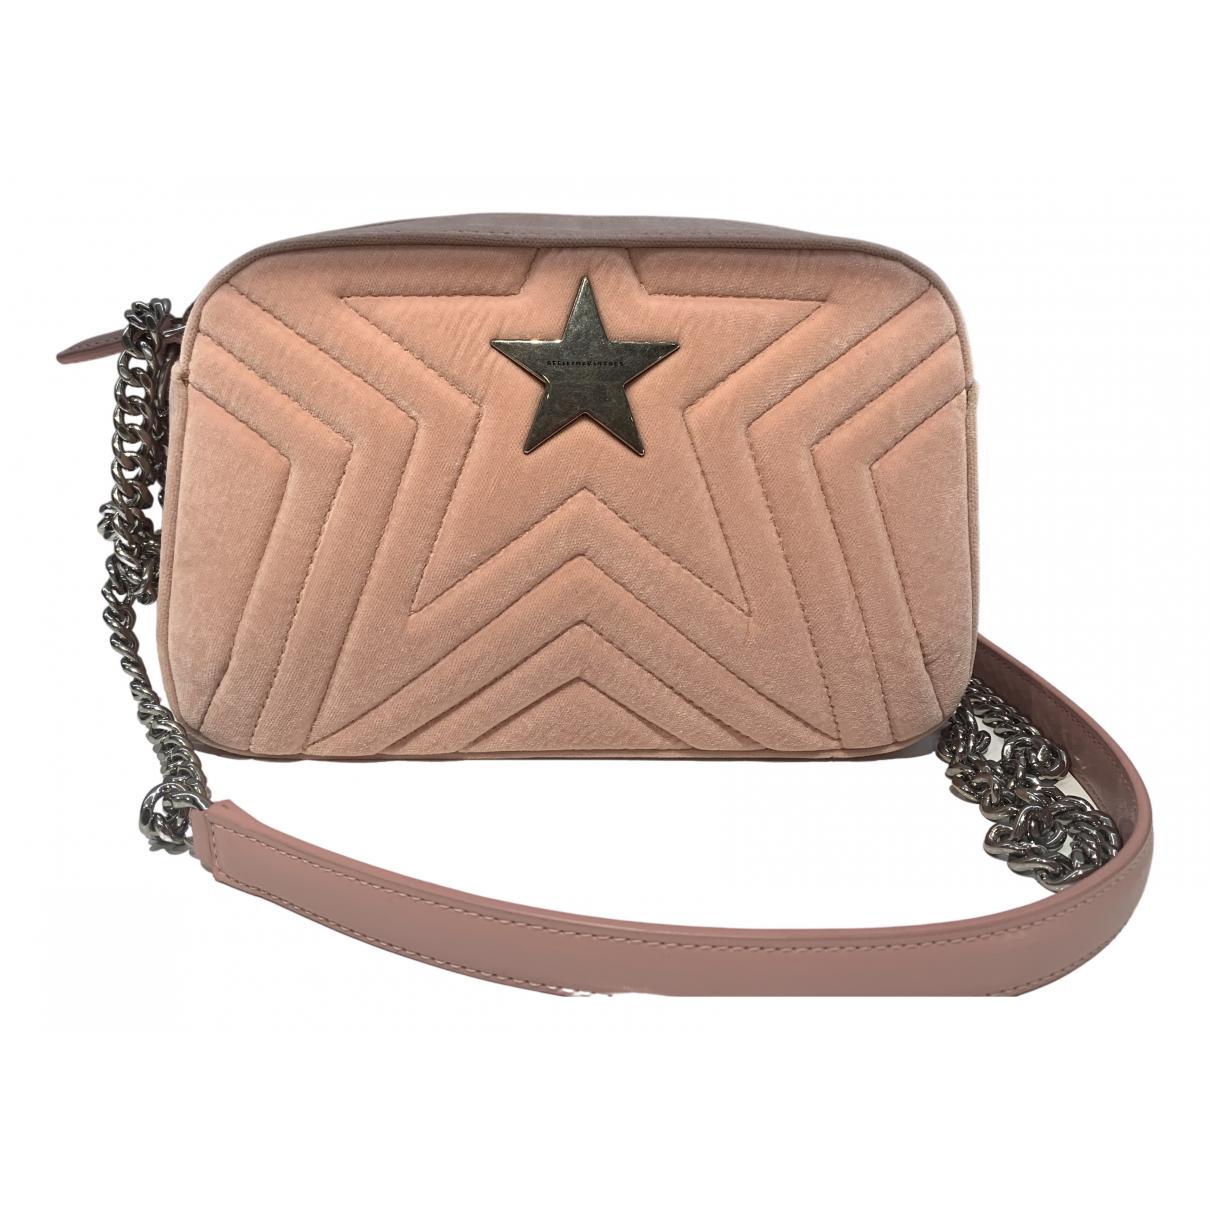 Stella Mccartney - Sac a main Stella Star pour femme en toile - rose